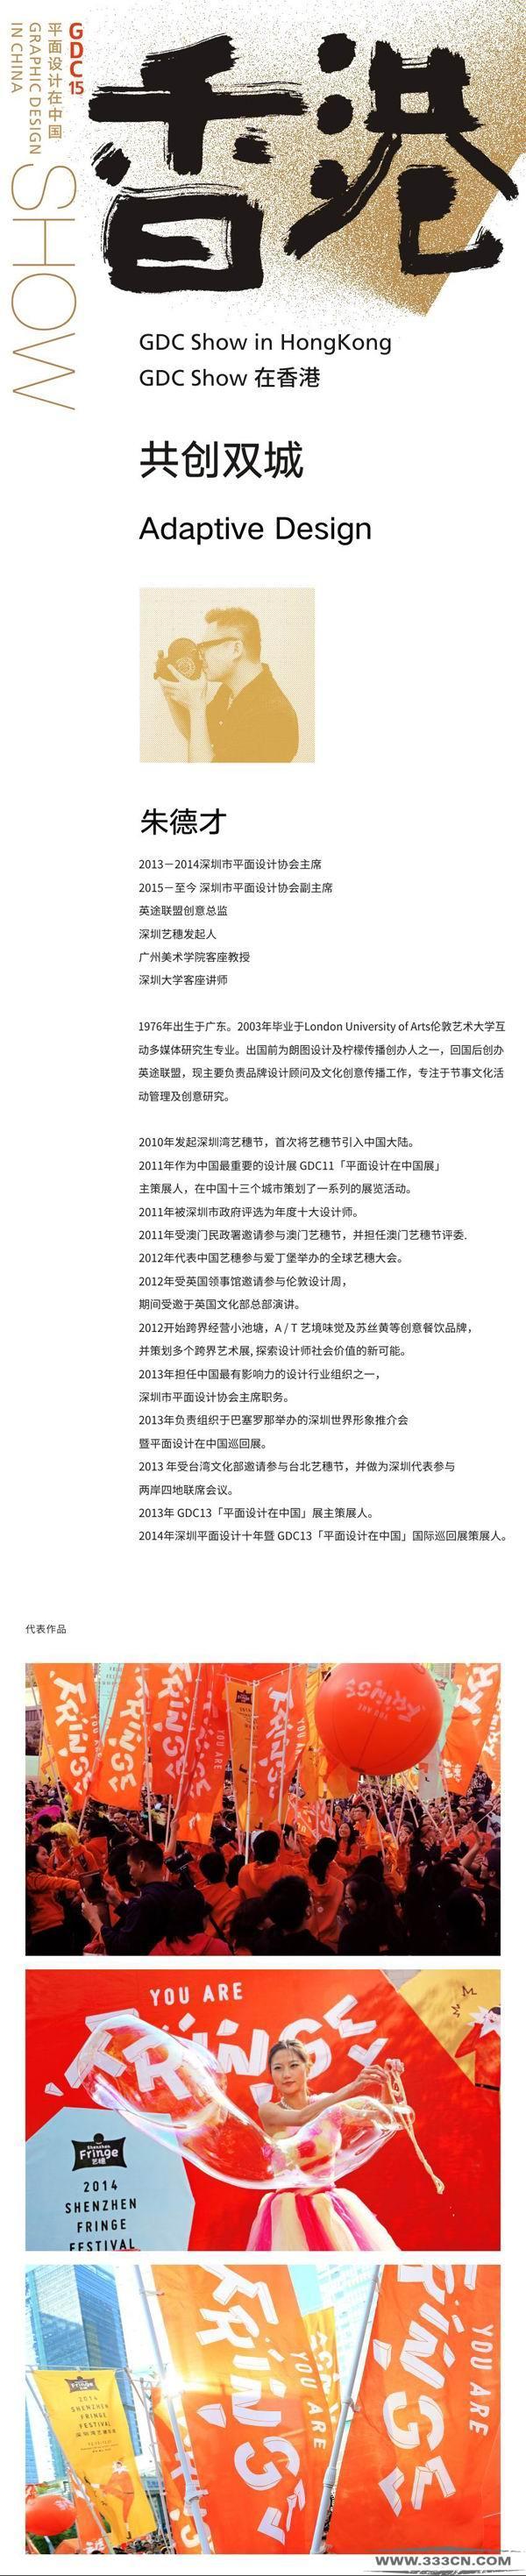 GDC Show 在香港 共创双城 平面设计在中国